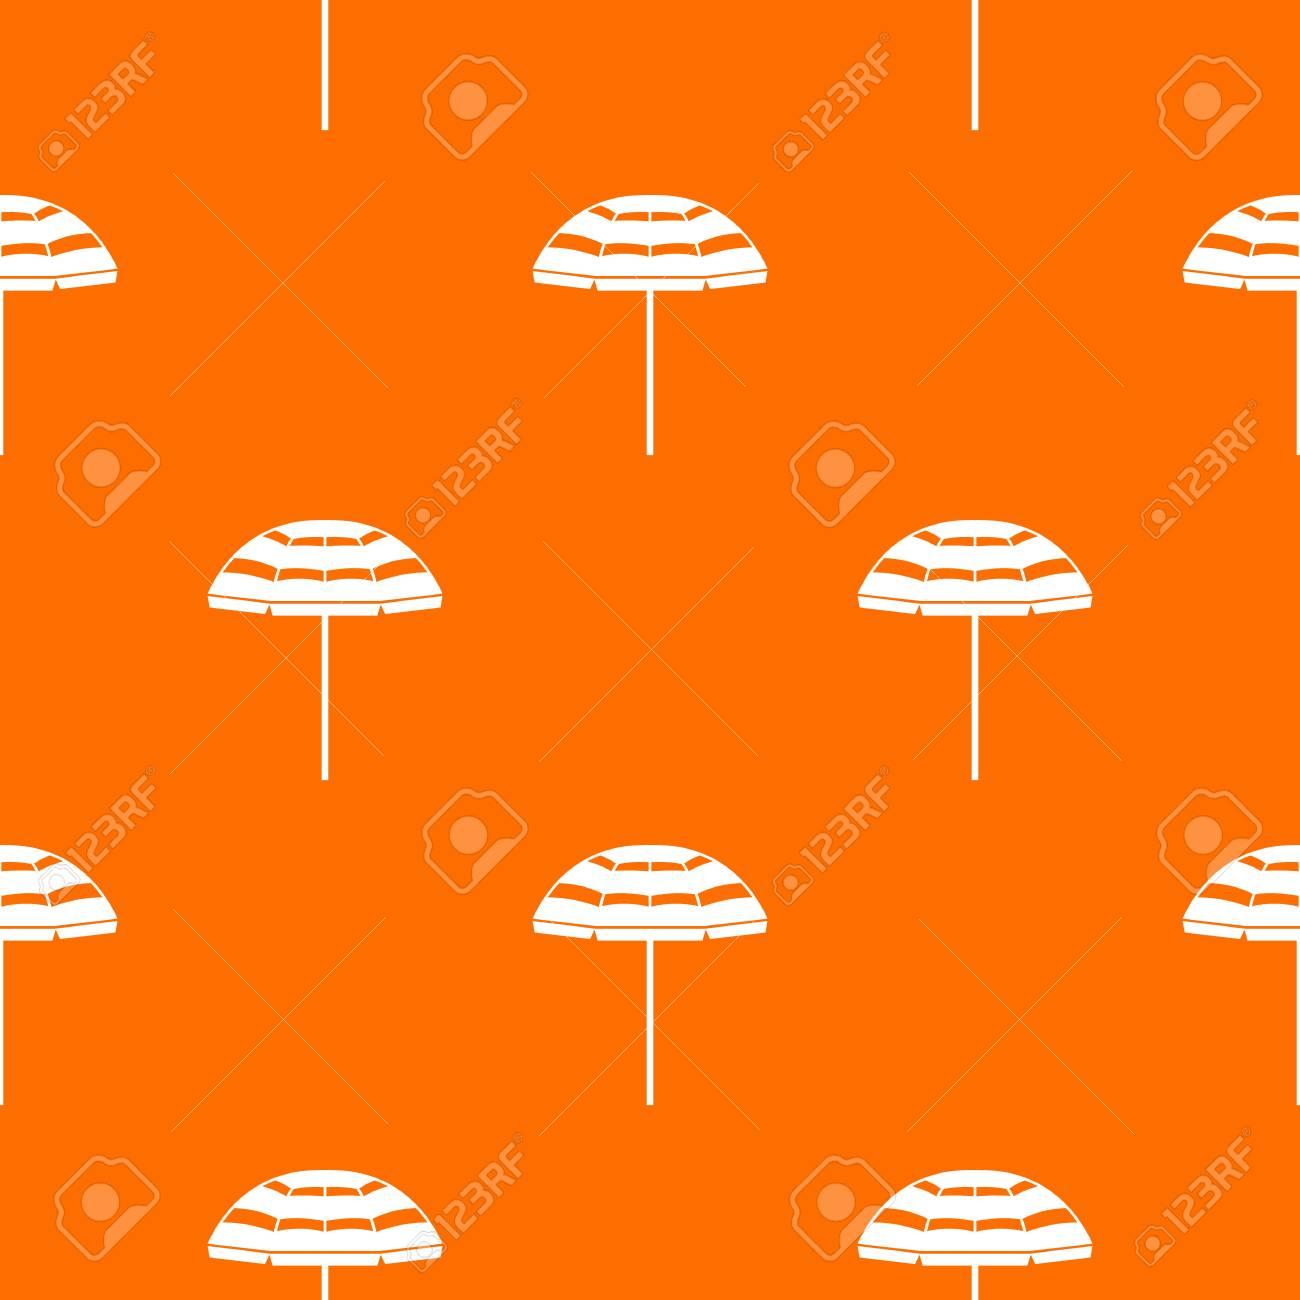 Beach umbrella pattern repeat seamless in orange color for any design. Vector geometric illustration - 83981687